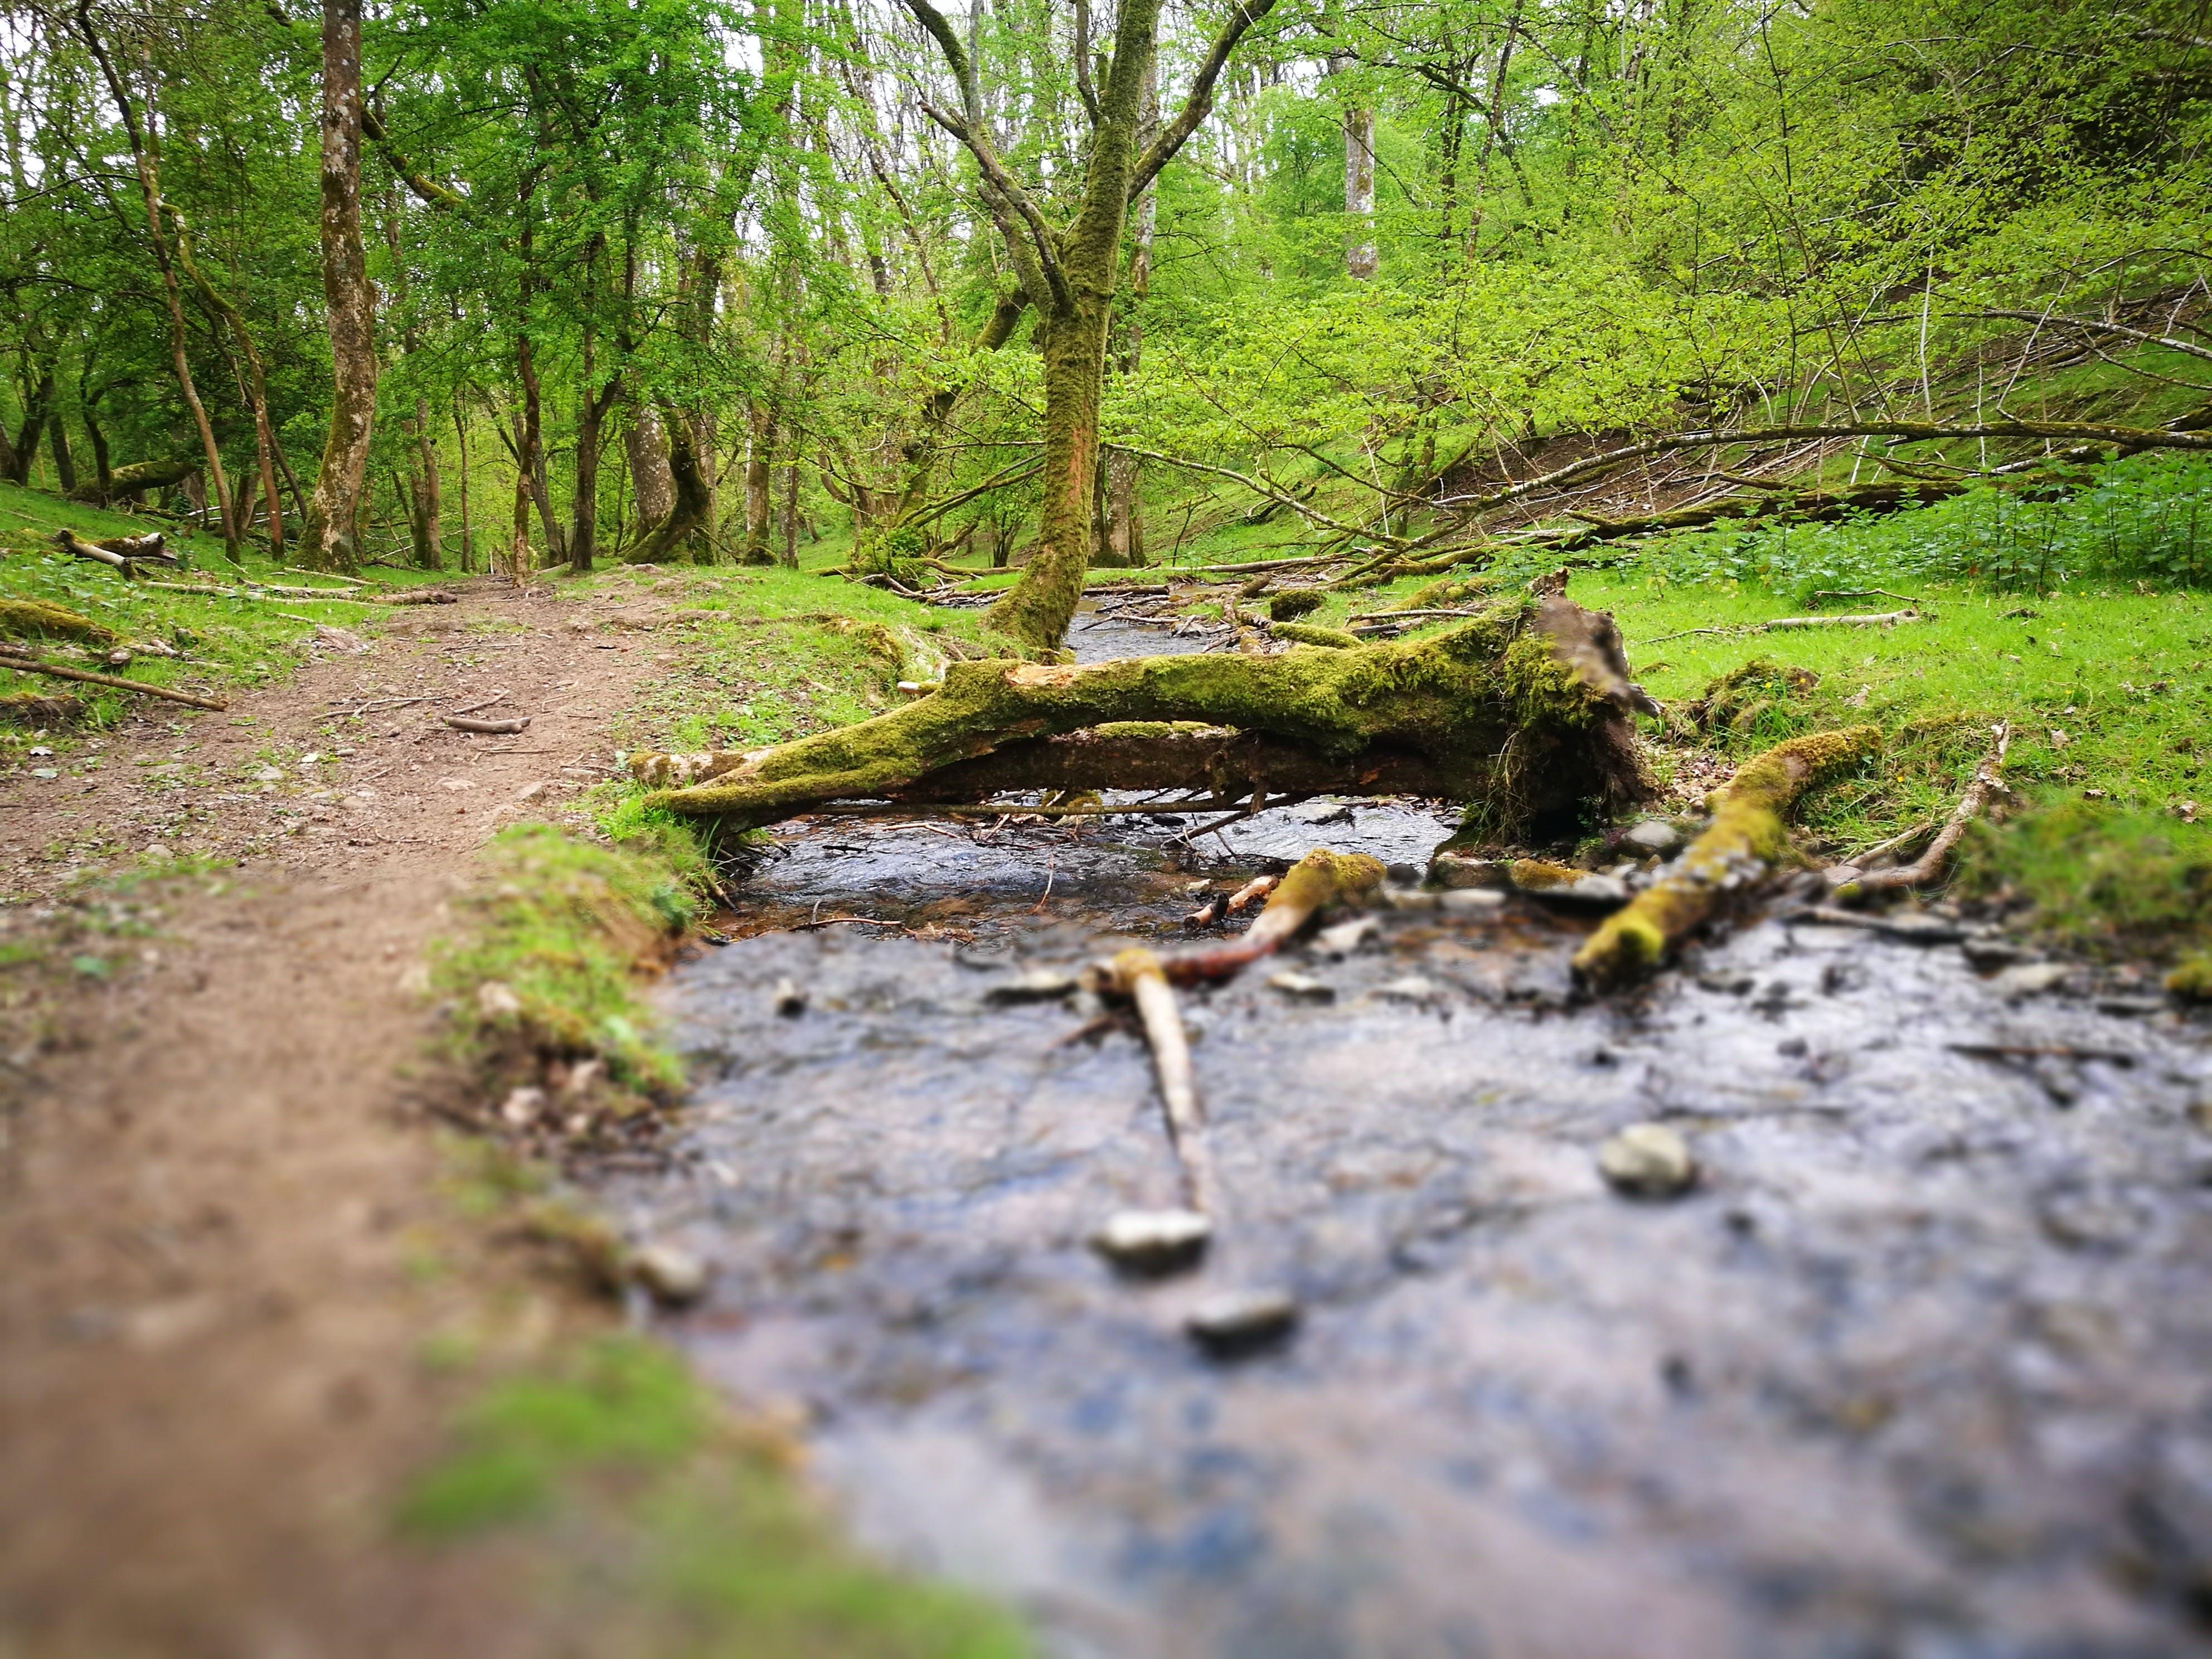 Základová fotografie zdarma na téma lesnatý kraj, padlý strom, proud, stezka